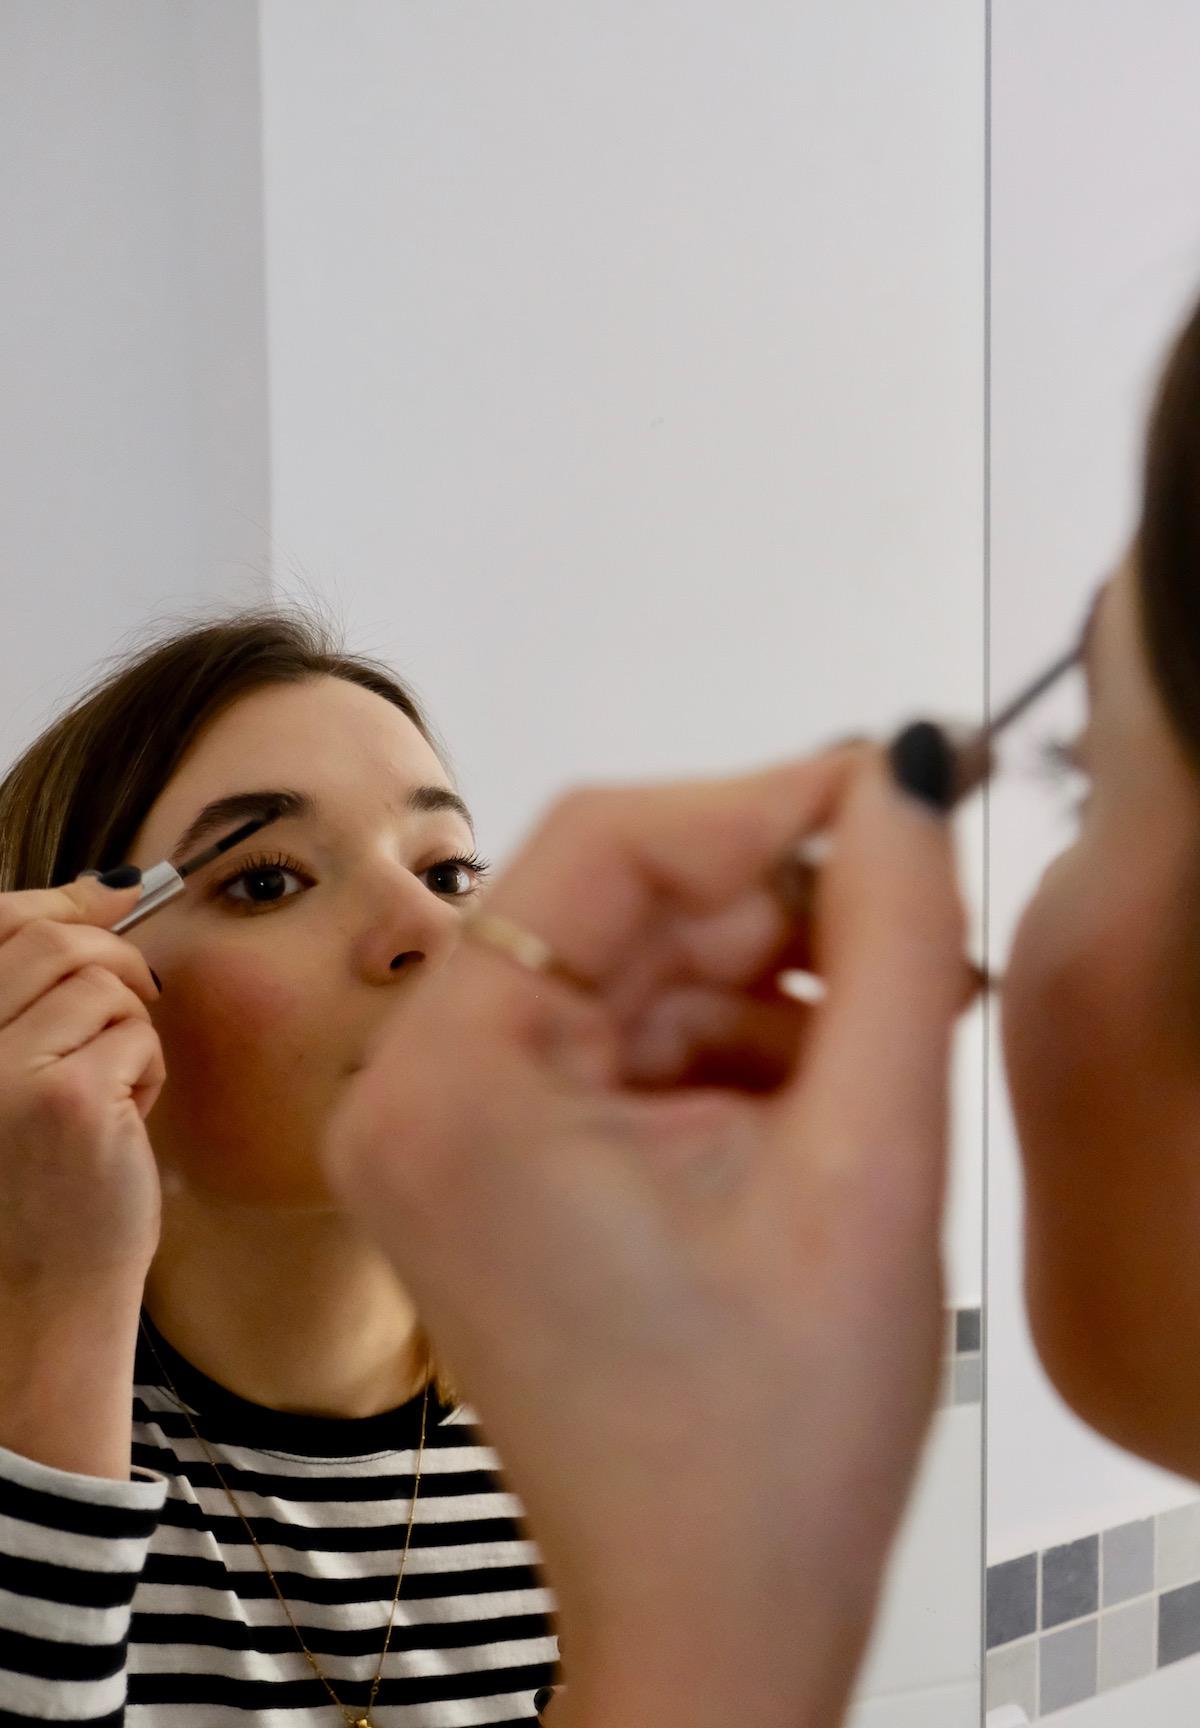 Beautyblog Beautyblogger BARE MINDS Elina neumann Glossier Brow Boy Annika Rogge